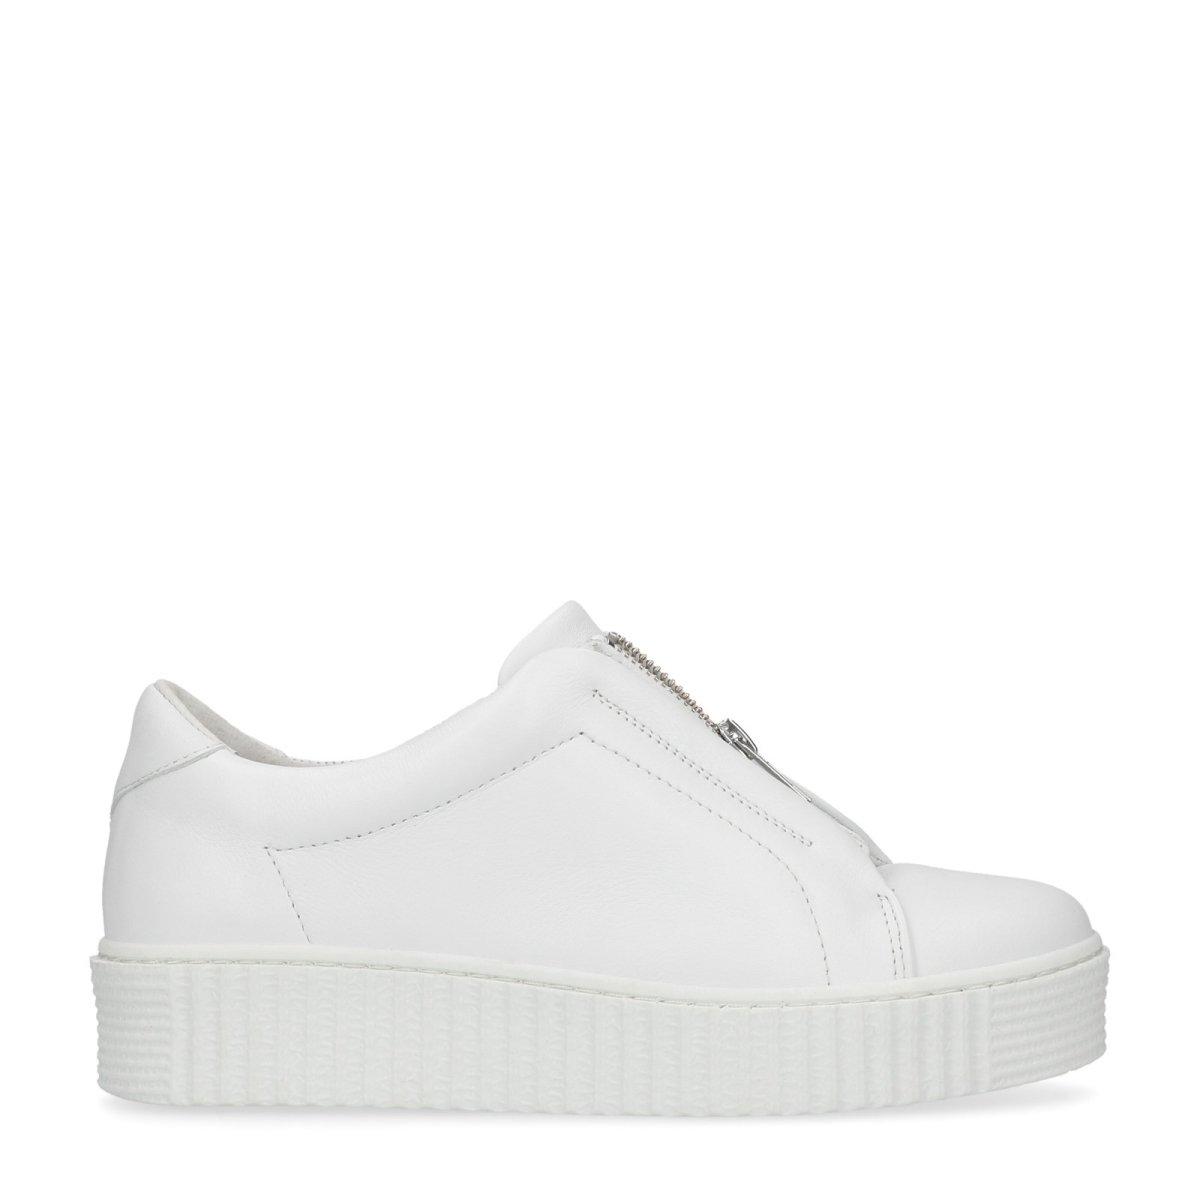 Sacha Schuhe   Damen Turnschuhe Low     Leder   Farbe  Weiß 08c525